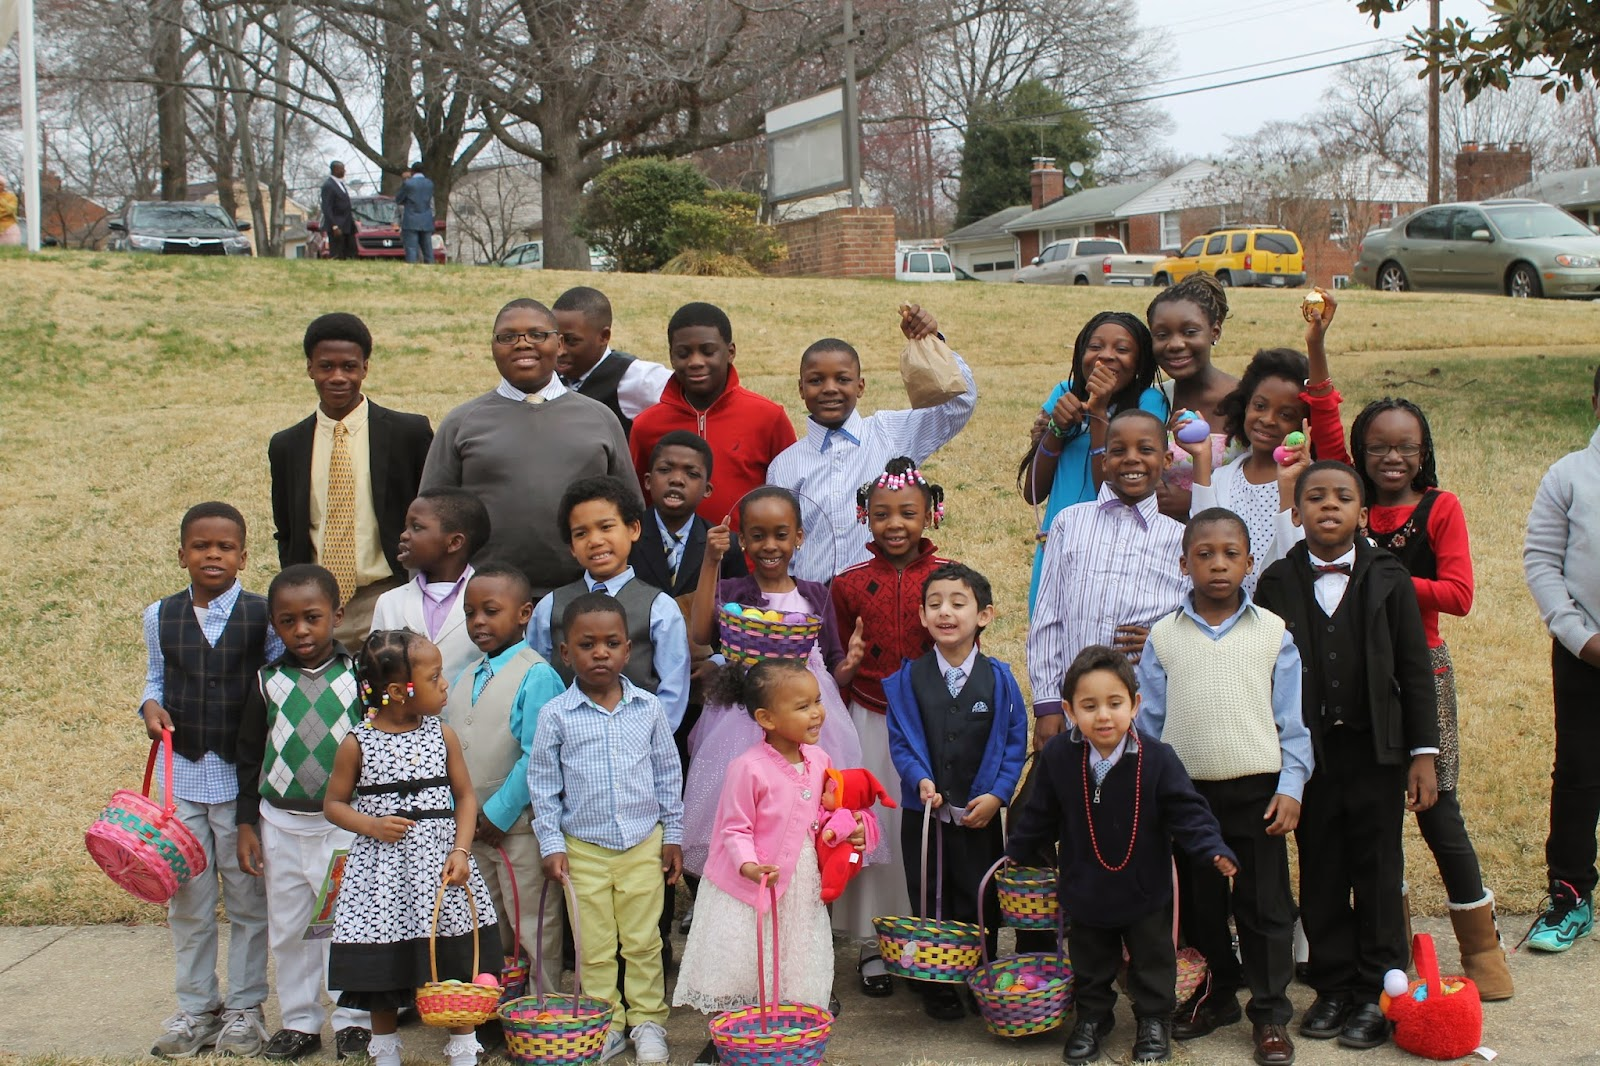 2015 - Easter Sunday